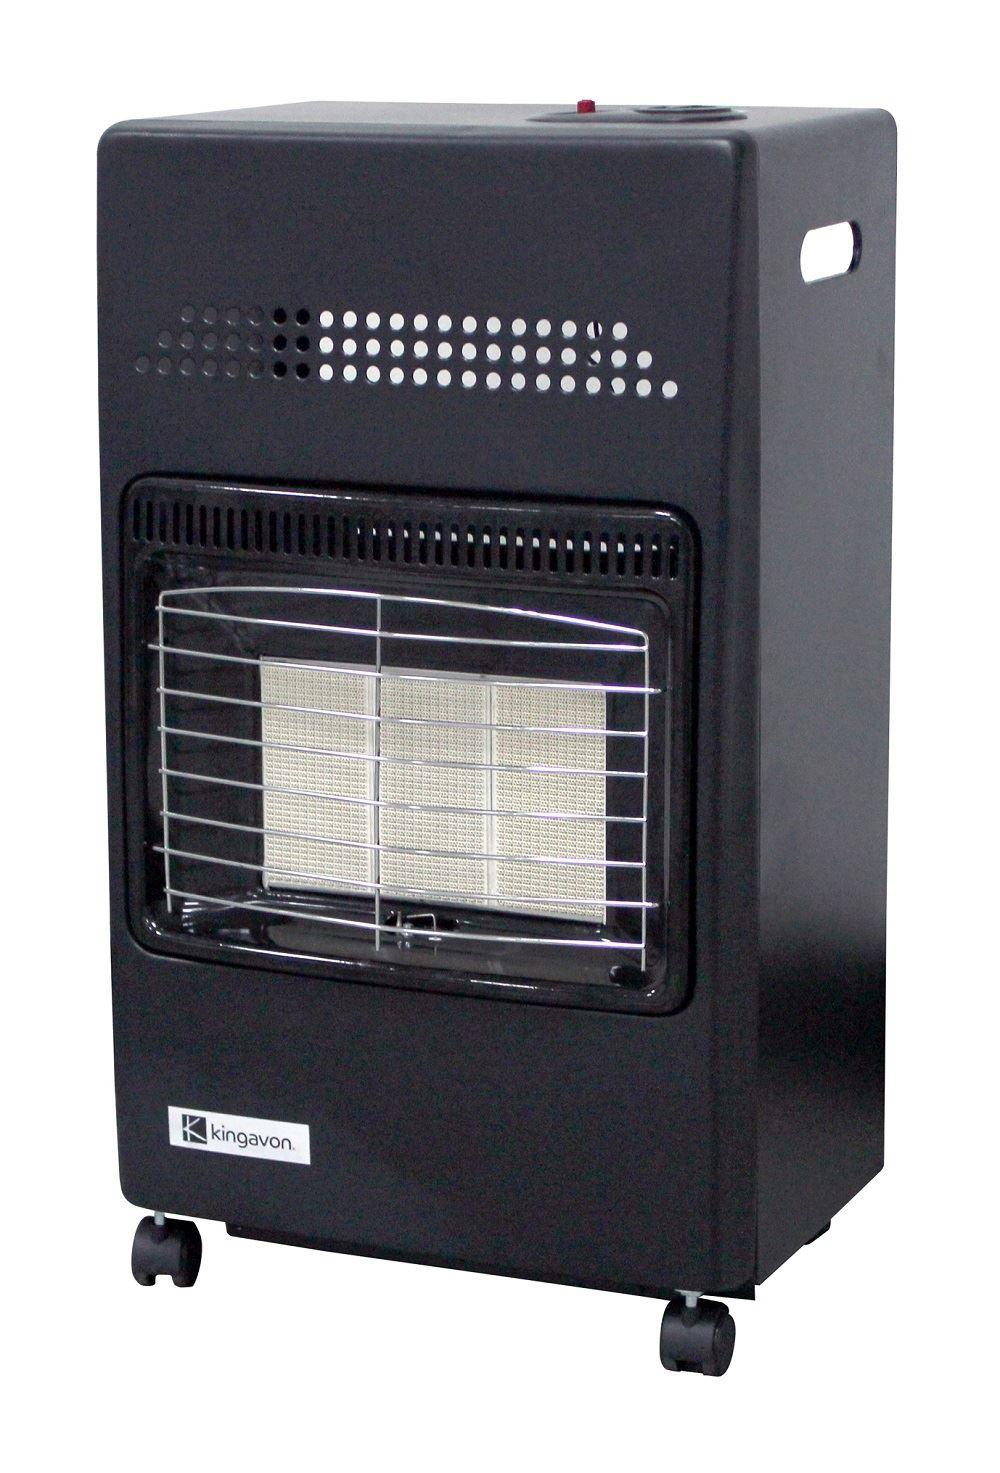 4 2kw Portable Cabinet Calor Gas Heater Butane Radiant